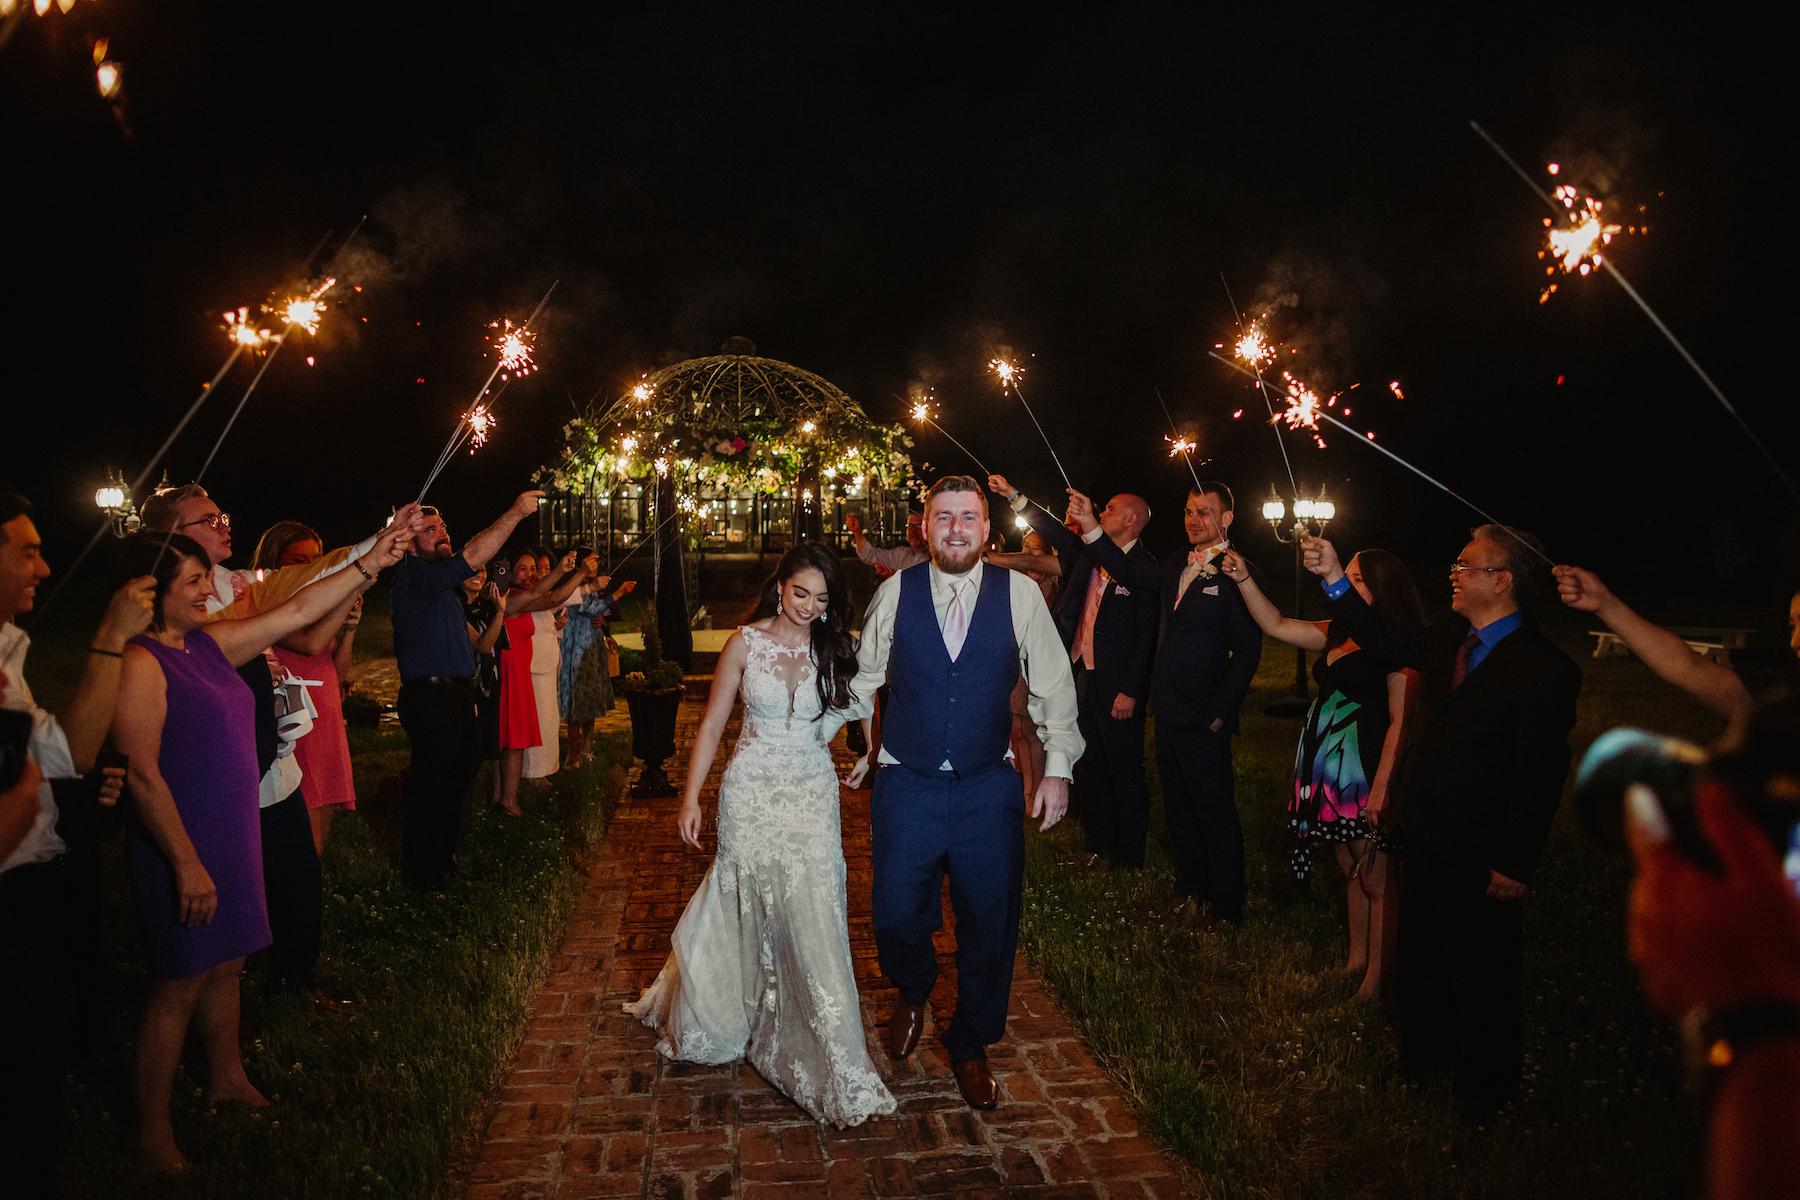 edinburgh-west-wedding-taylors-sc-852.JPG